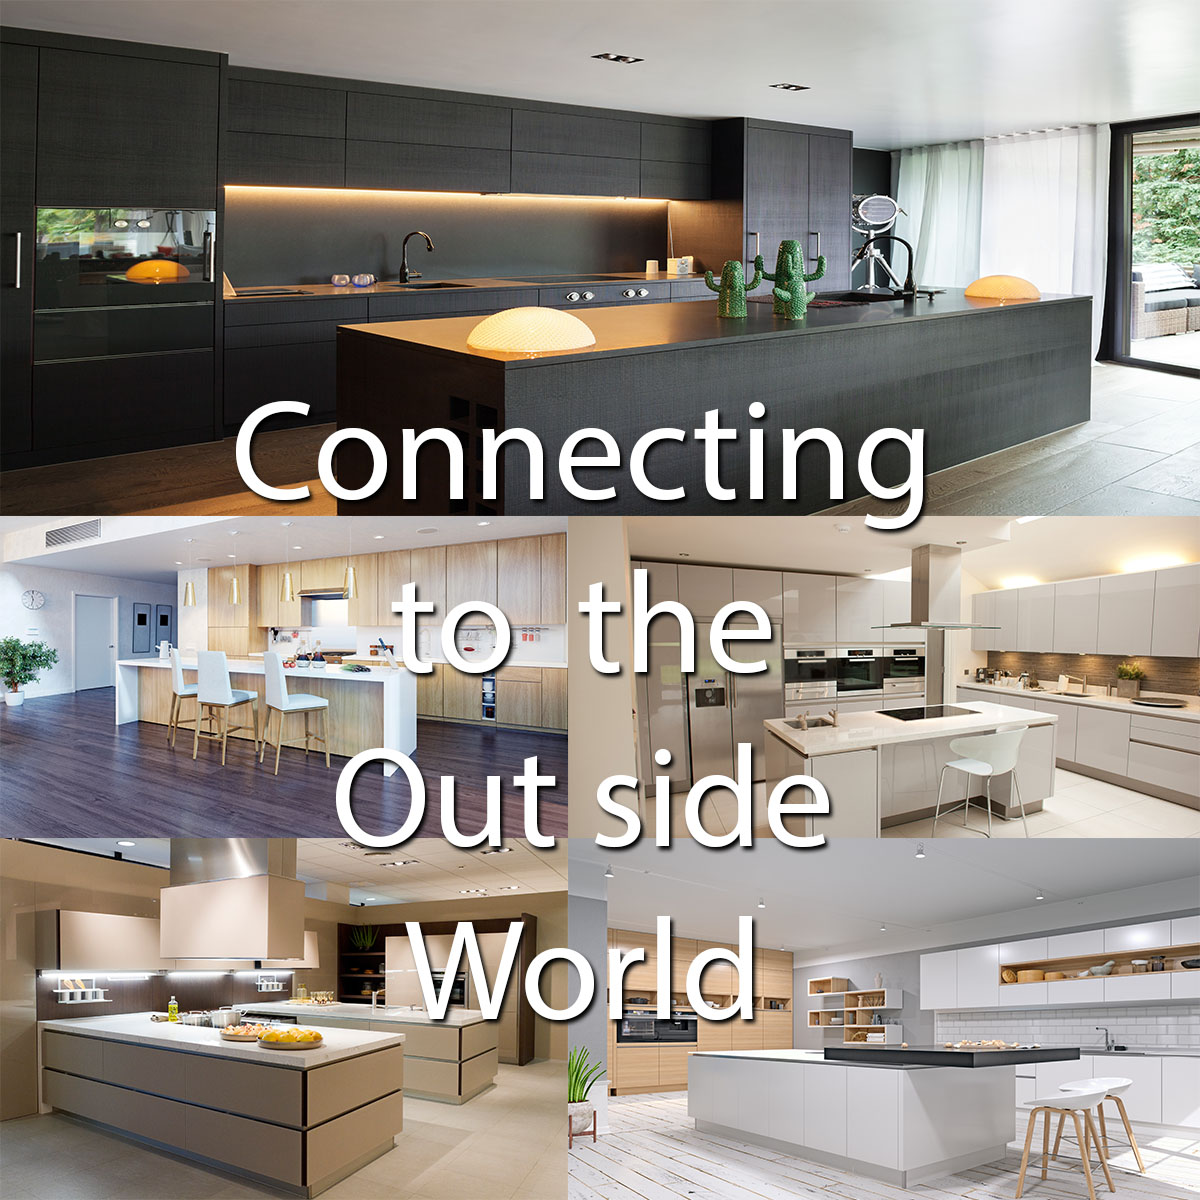 https://www.wudbell.com/wp-content/uploads/2020/03/I-shap-Kitchen.jpg